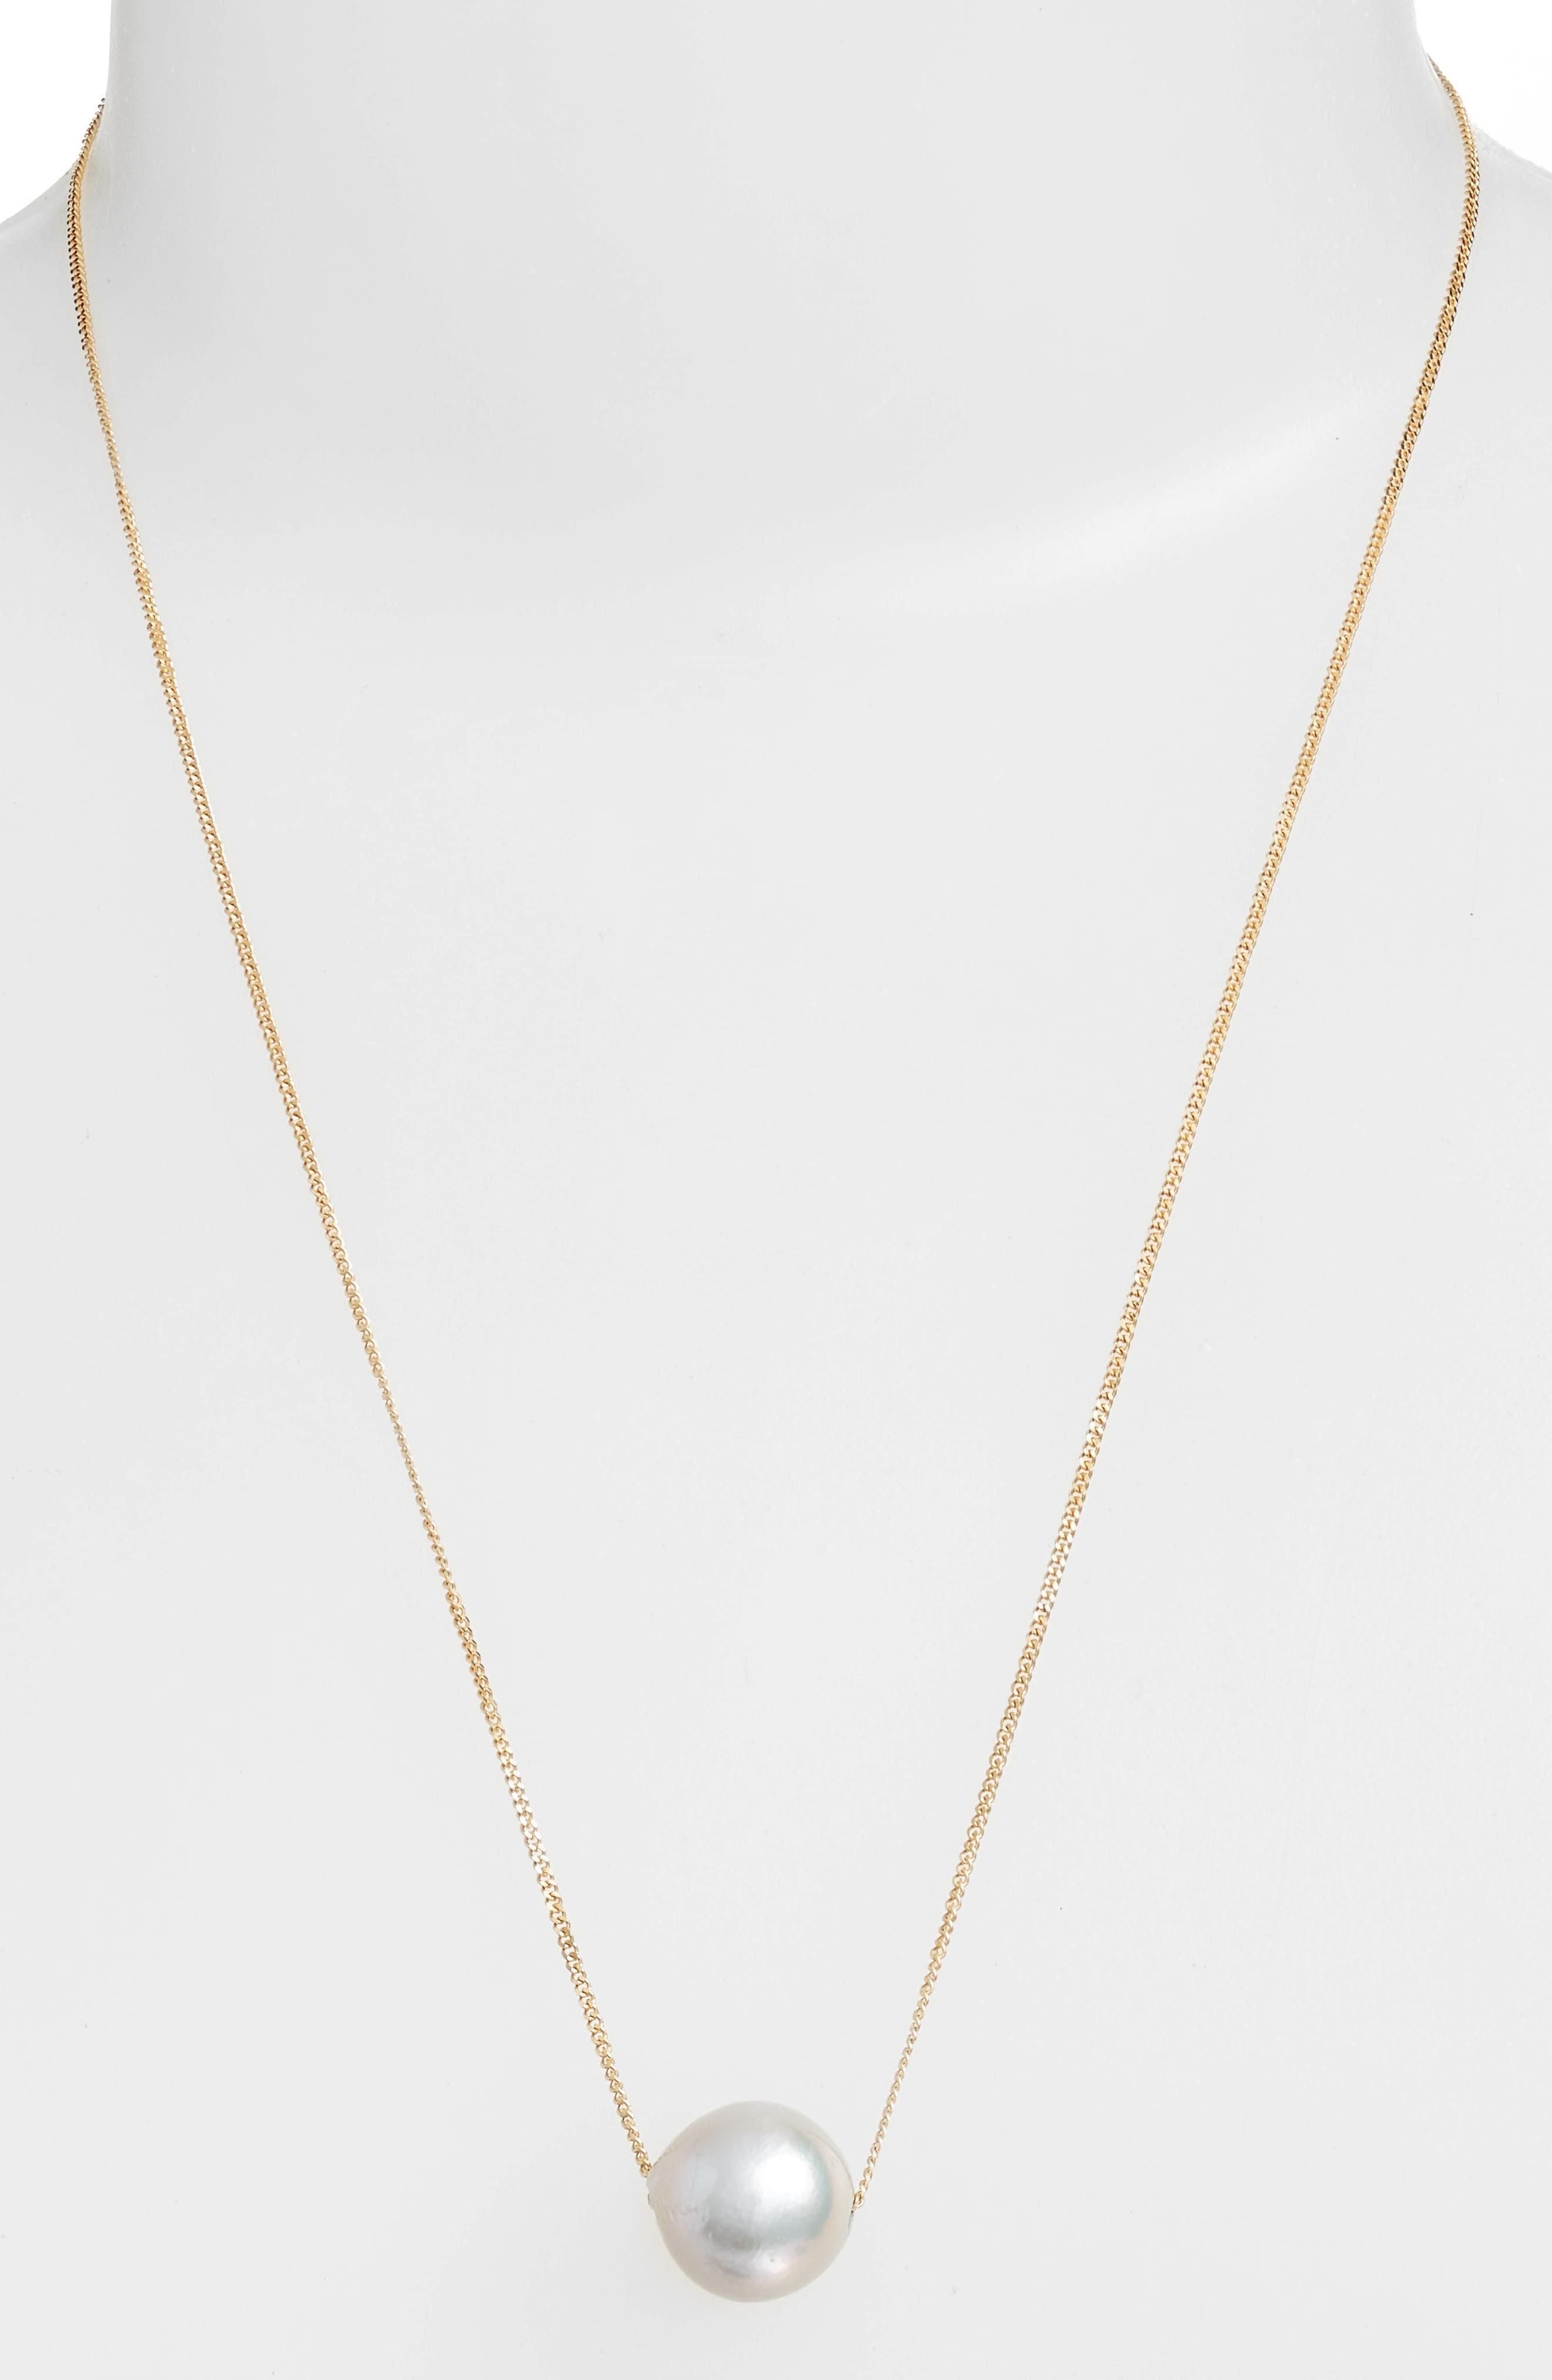 Pearl Pendant Necklace,                             Main thumbnail 1, color,                             051